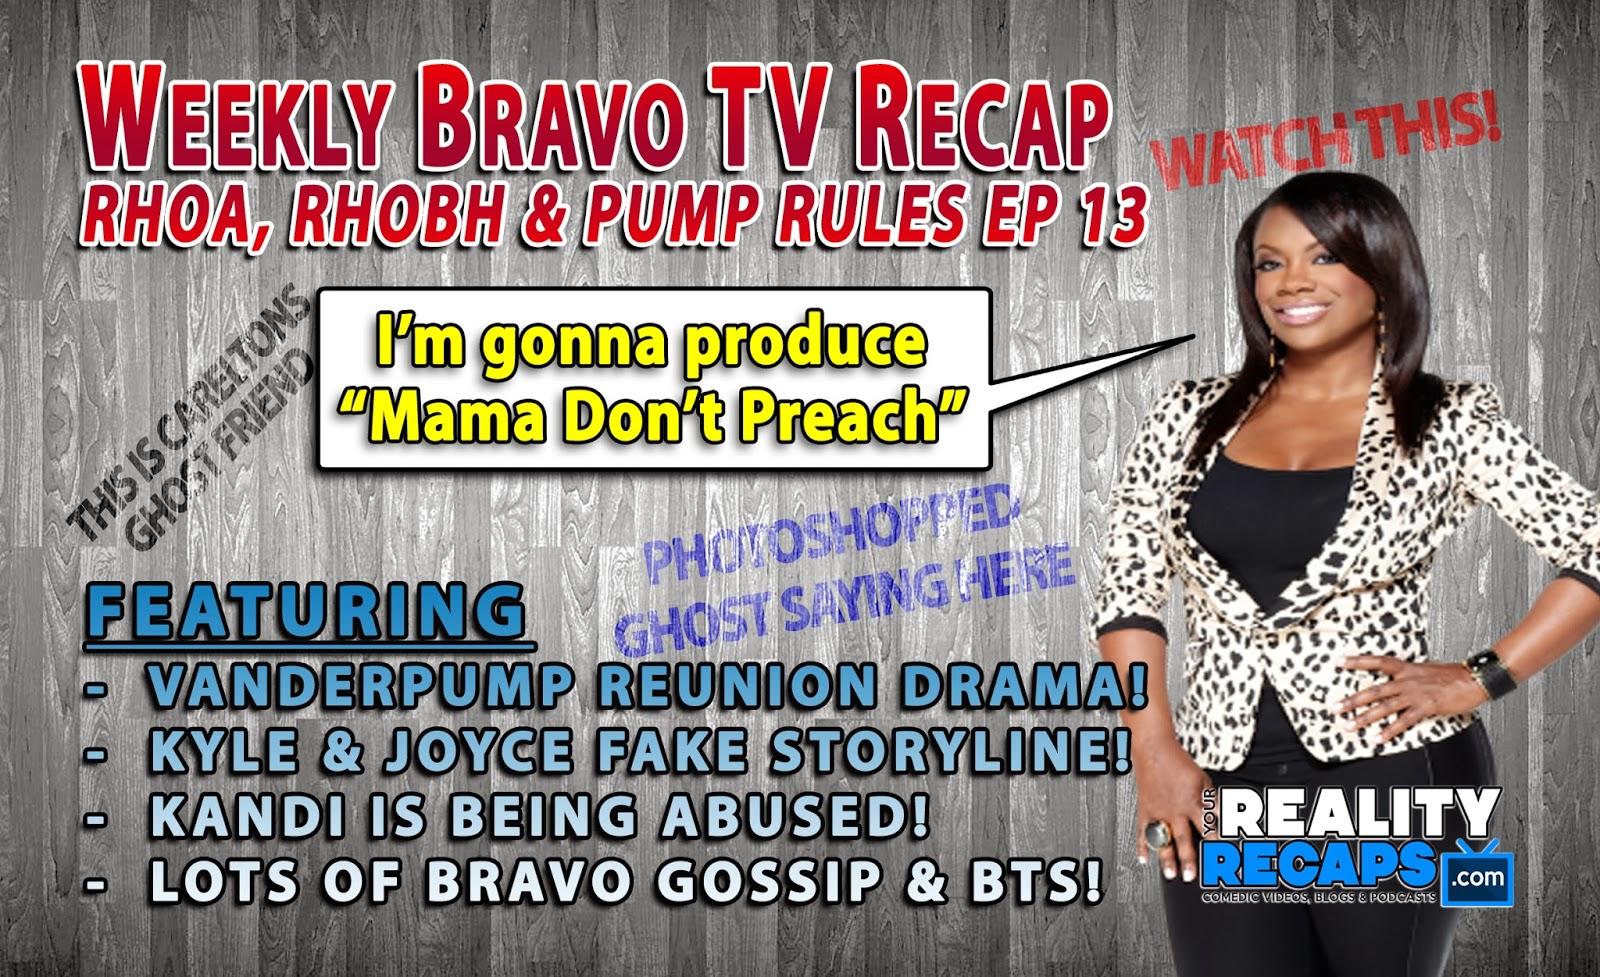 Bravo Weekly Comedic Recap EP 13:  RHOA, RHOBH & Vanderpump Rules Reunion!